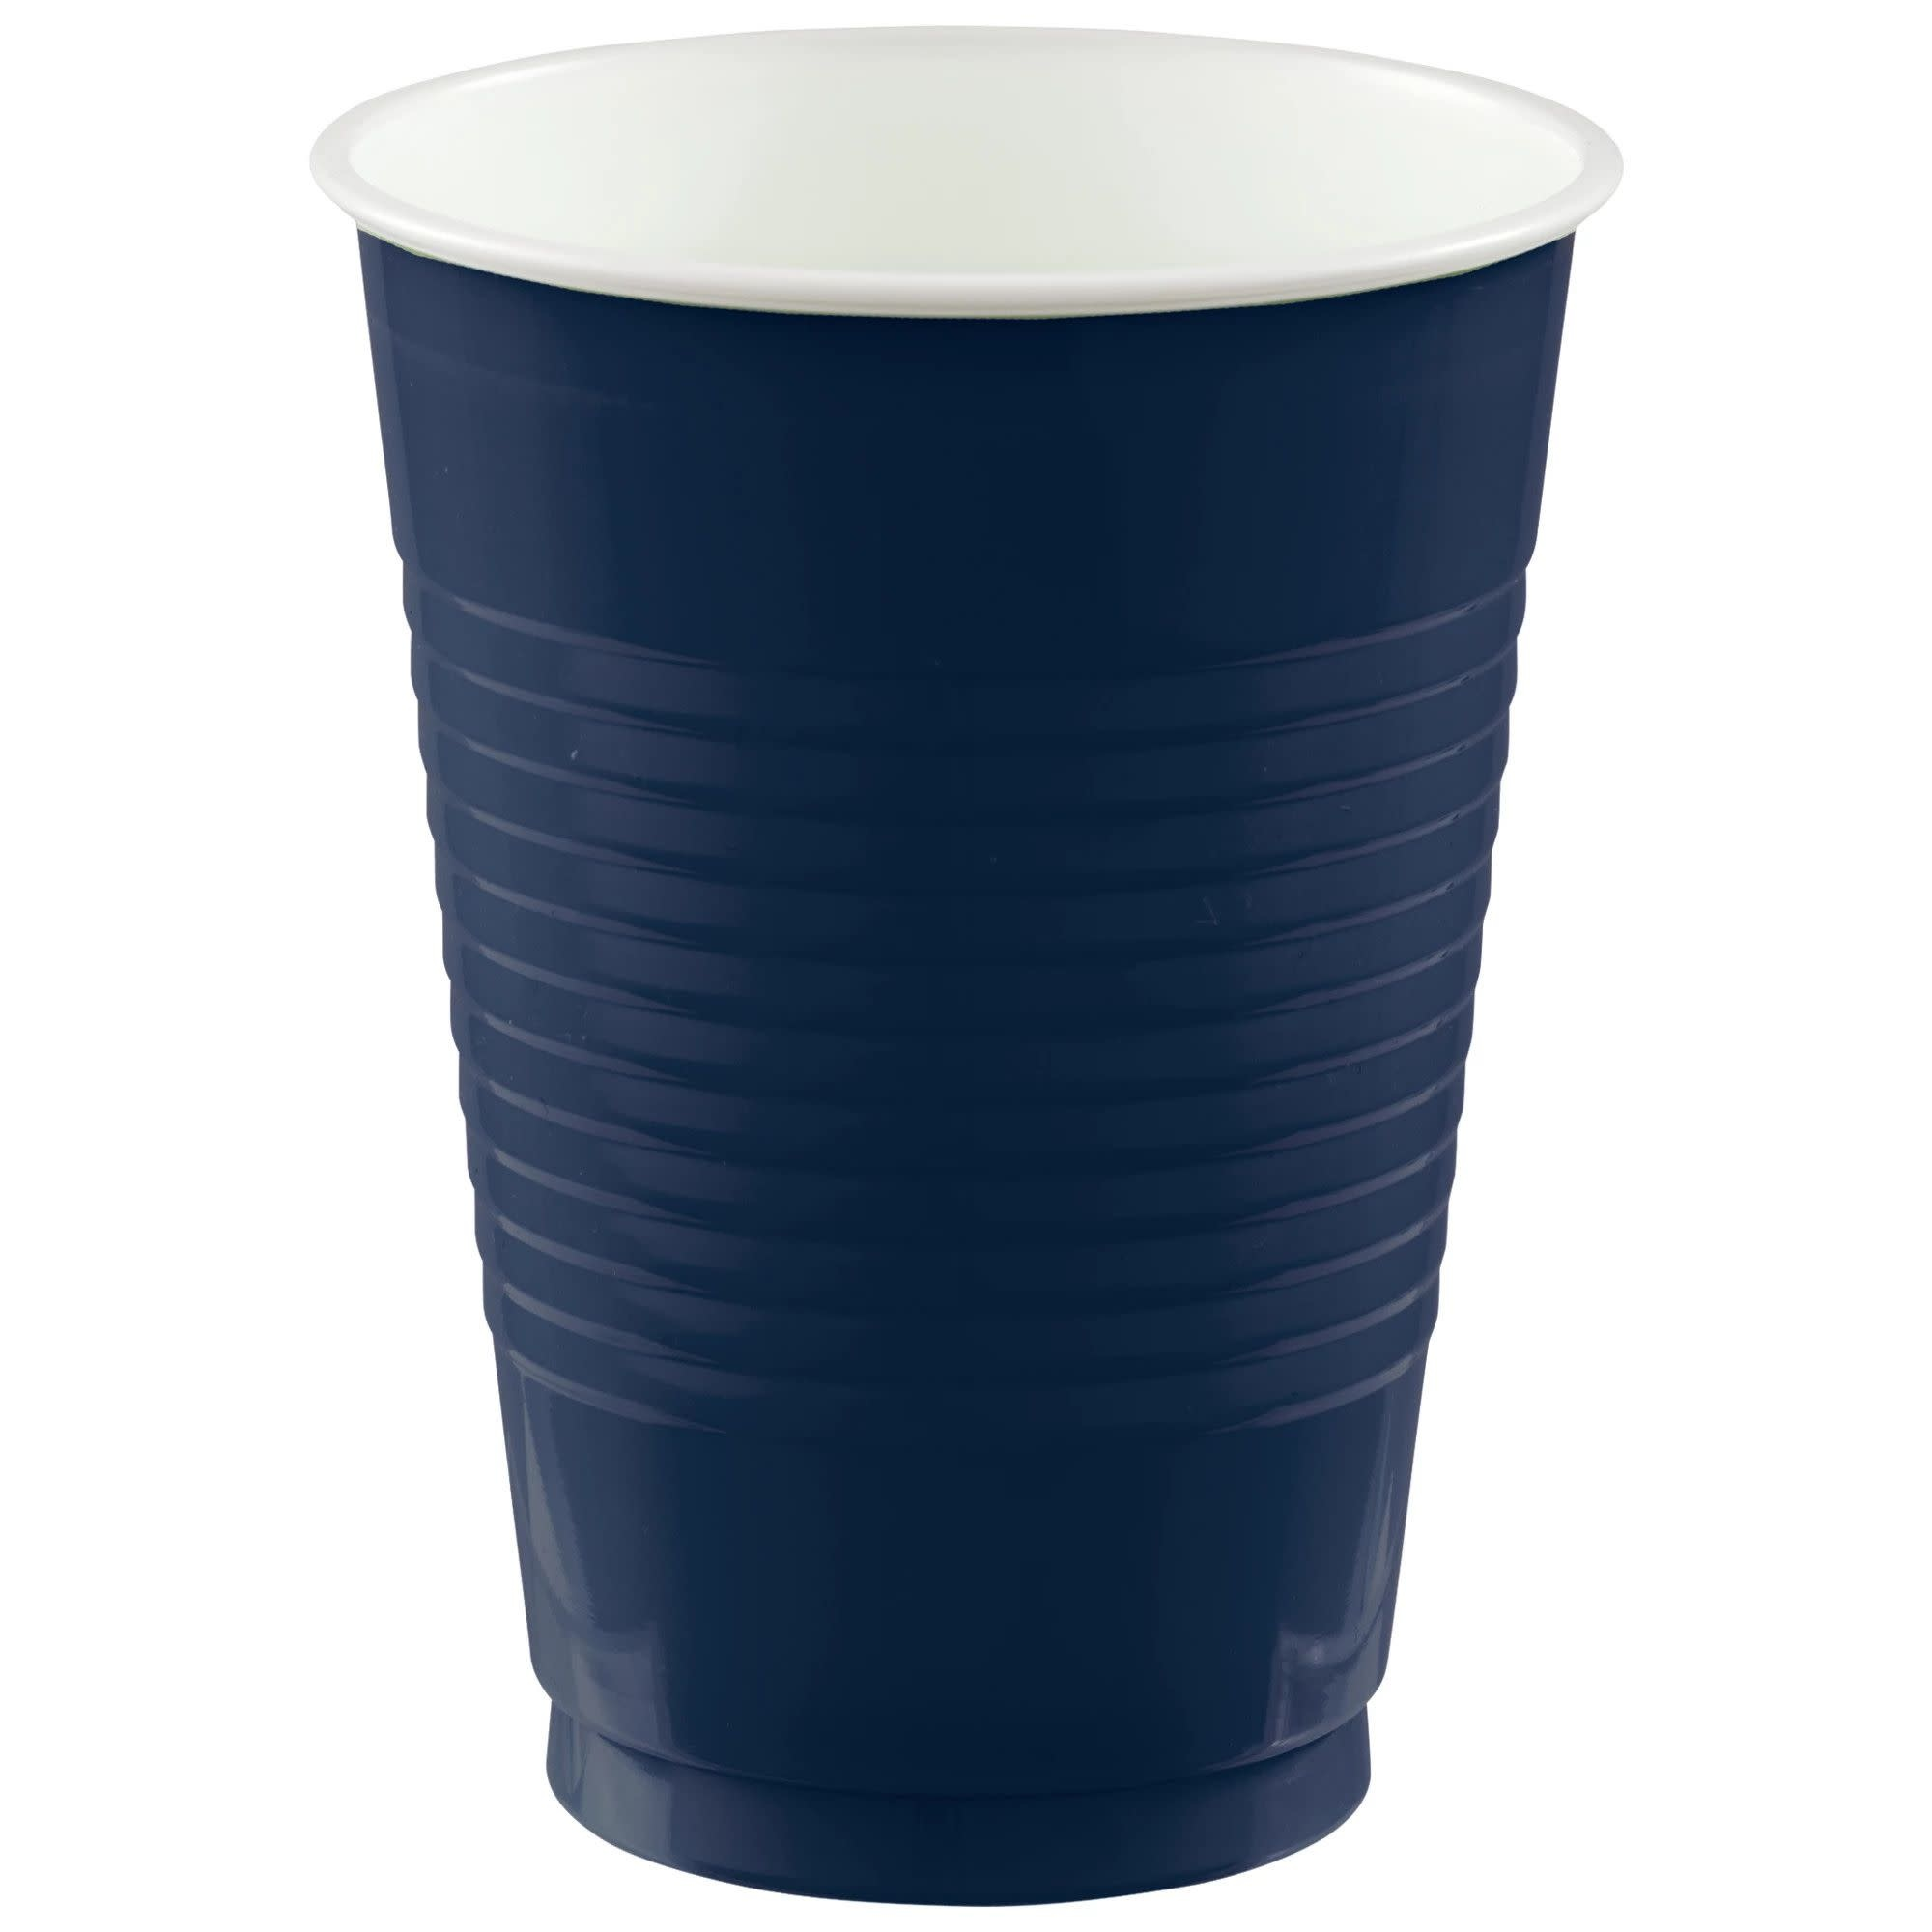 12 Oz. Plastic Cups, Mid Ct. - True Navy